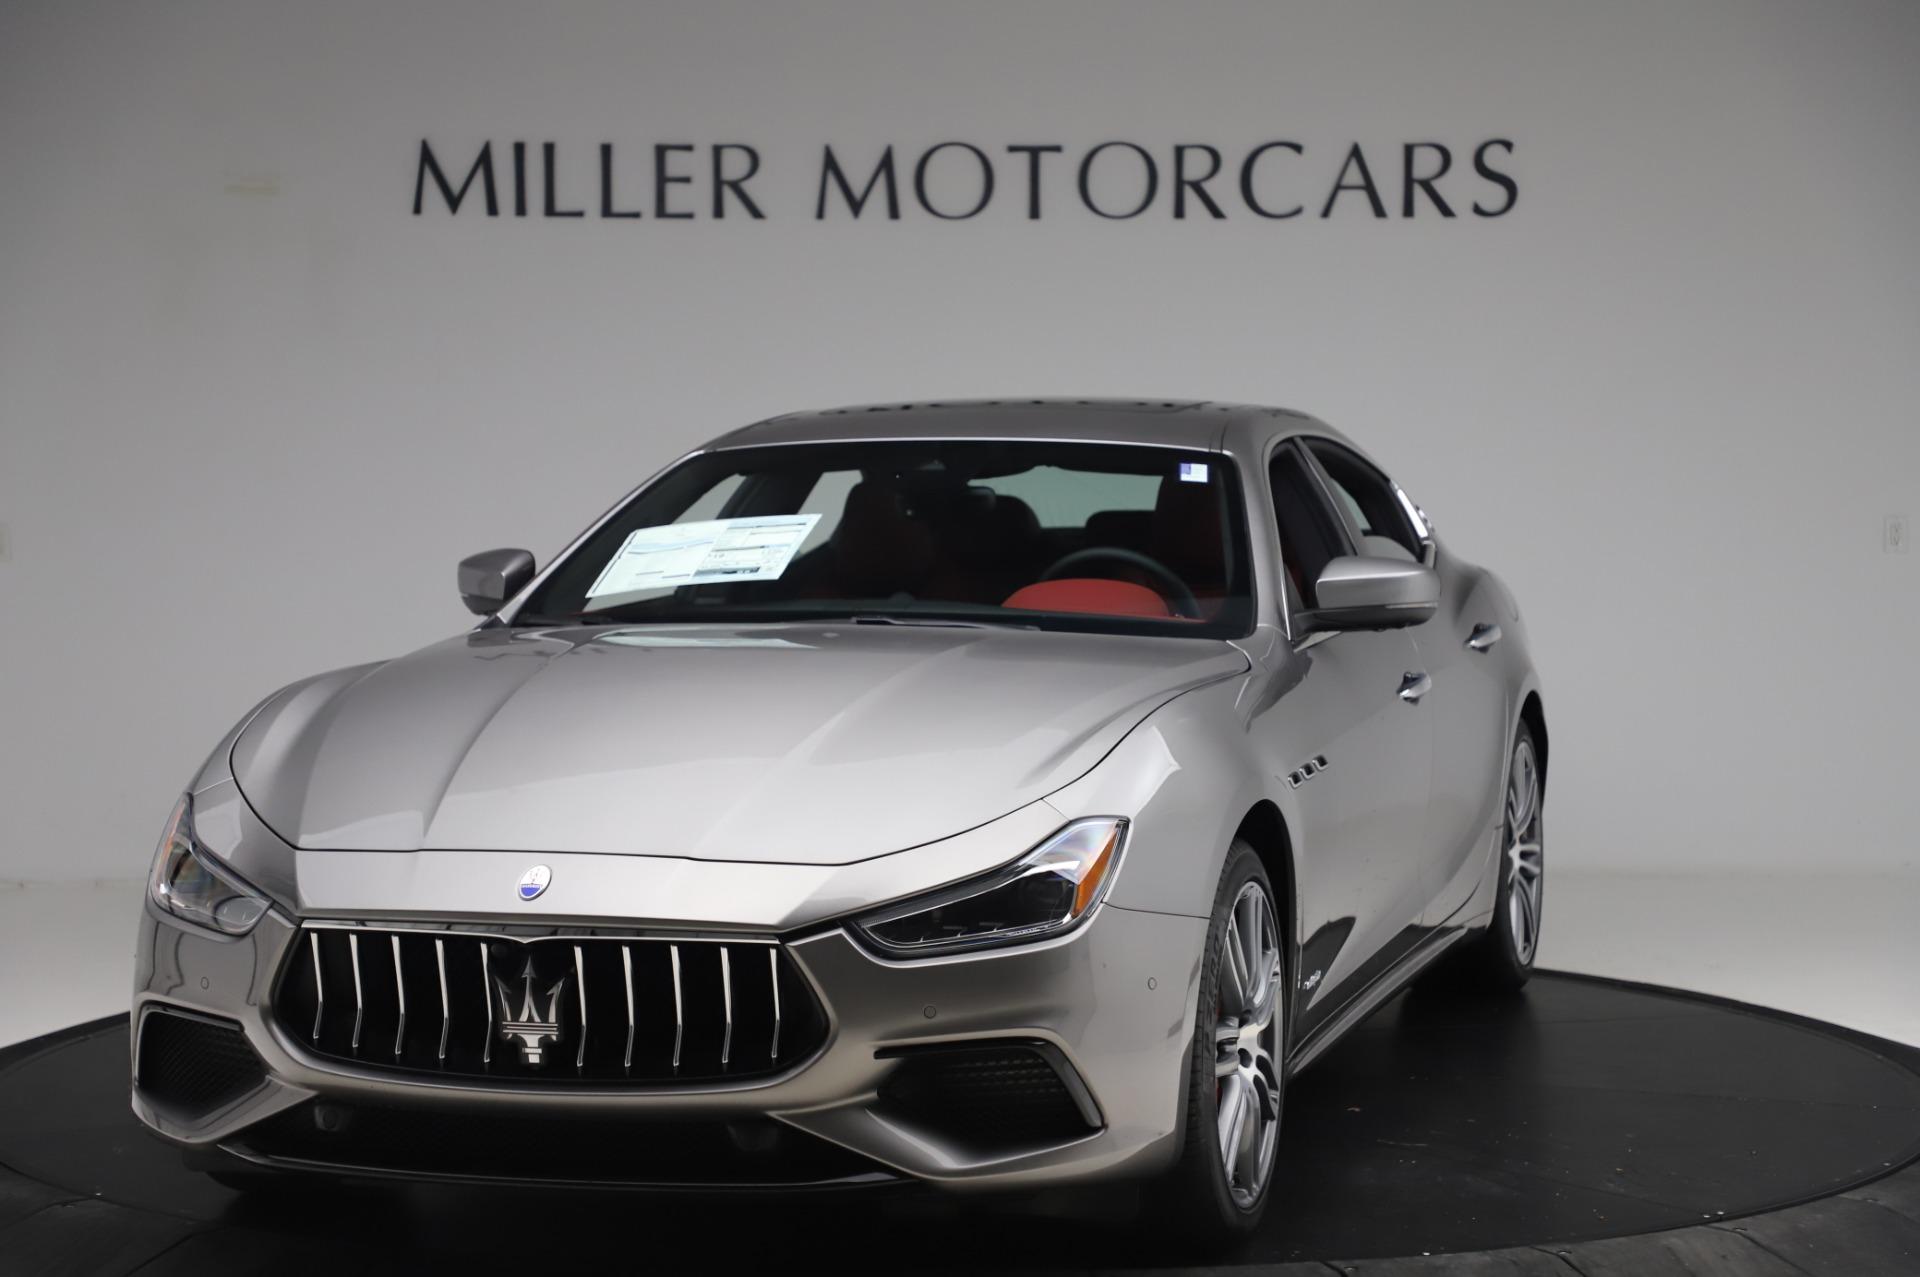 New 2020 Maserati Ghibli S Q4 GranSport for sale $93,285 at Bugatti of Greenwich in Greenwich CT 06830 1